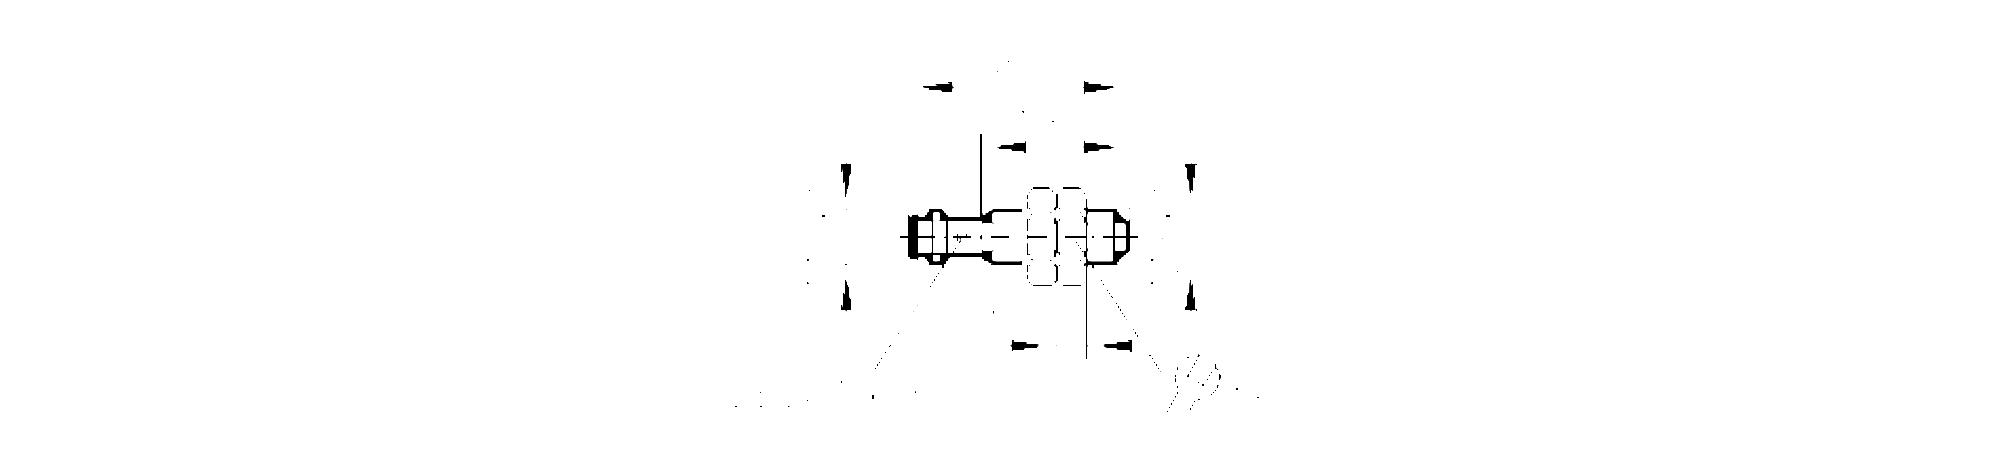 Ie5412 - Inductive Sensor